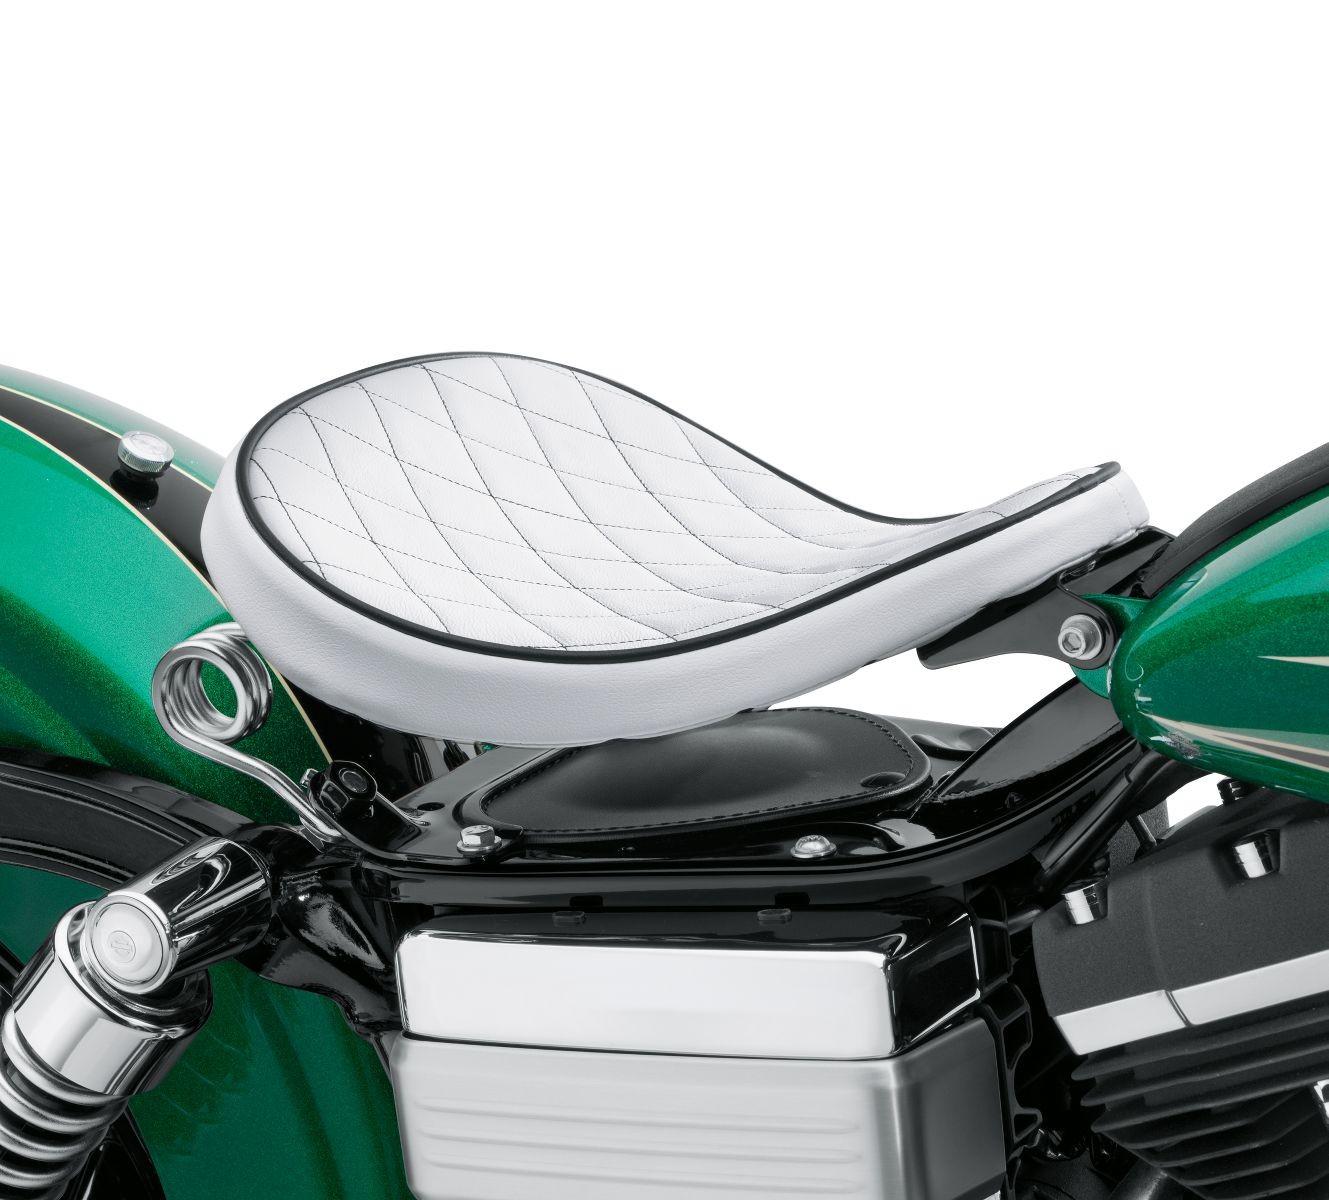 52000275 Harley Davidson White Diamond Solo Spring Saddle Leather Protectant Chester